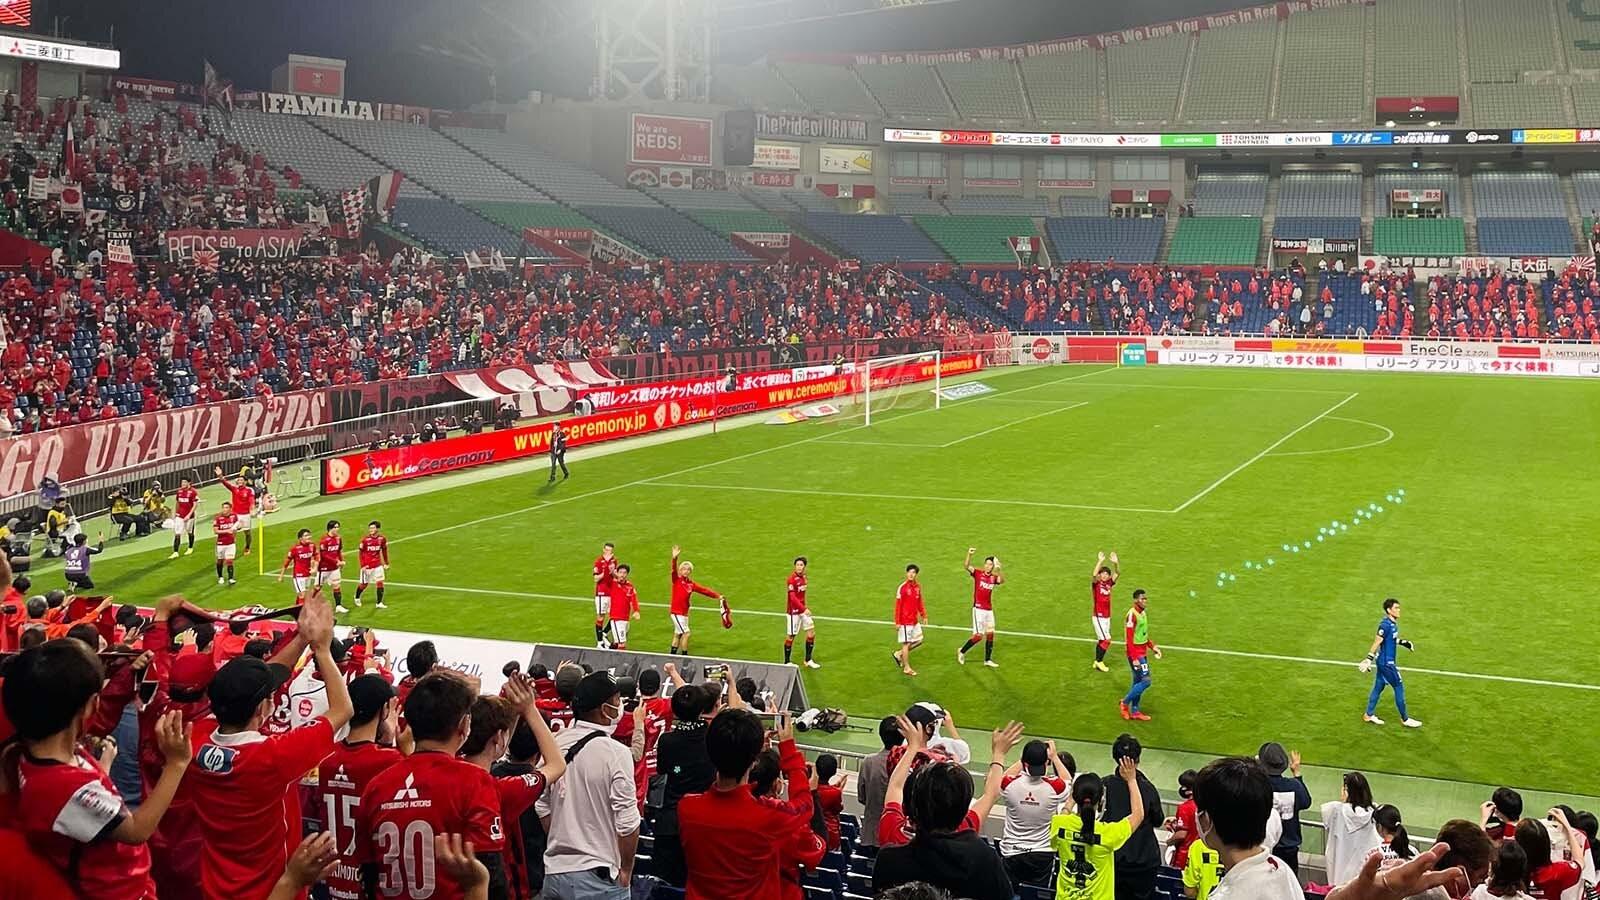 2021 Jリーグ 第29節 埼玉スタジアム2002 セレッソ大阪戦 試合終了後の様子